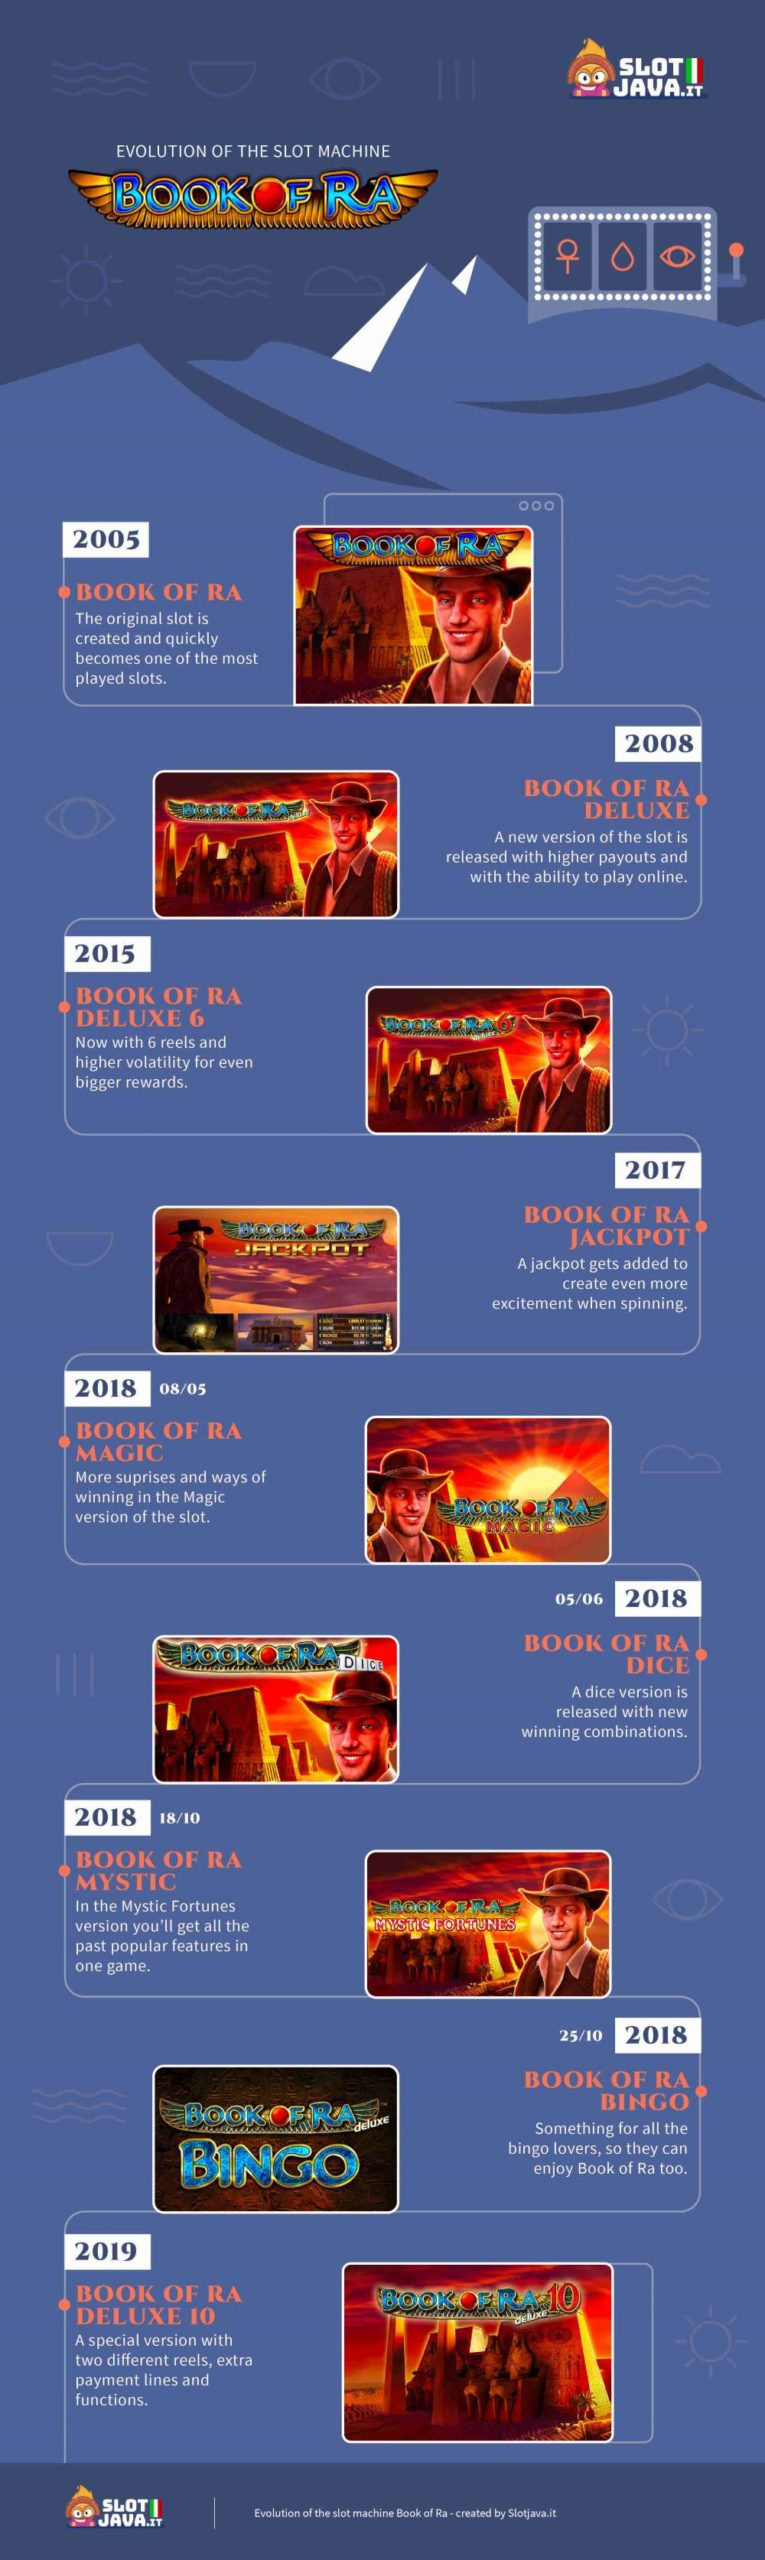 Evolution of Book of Ra